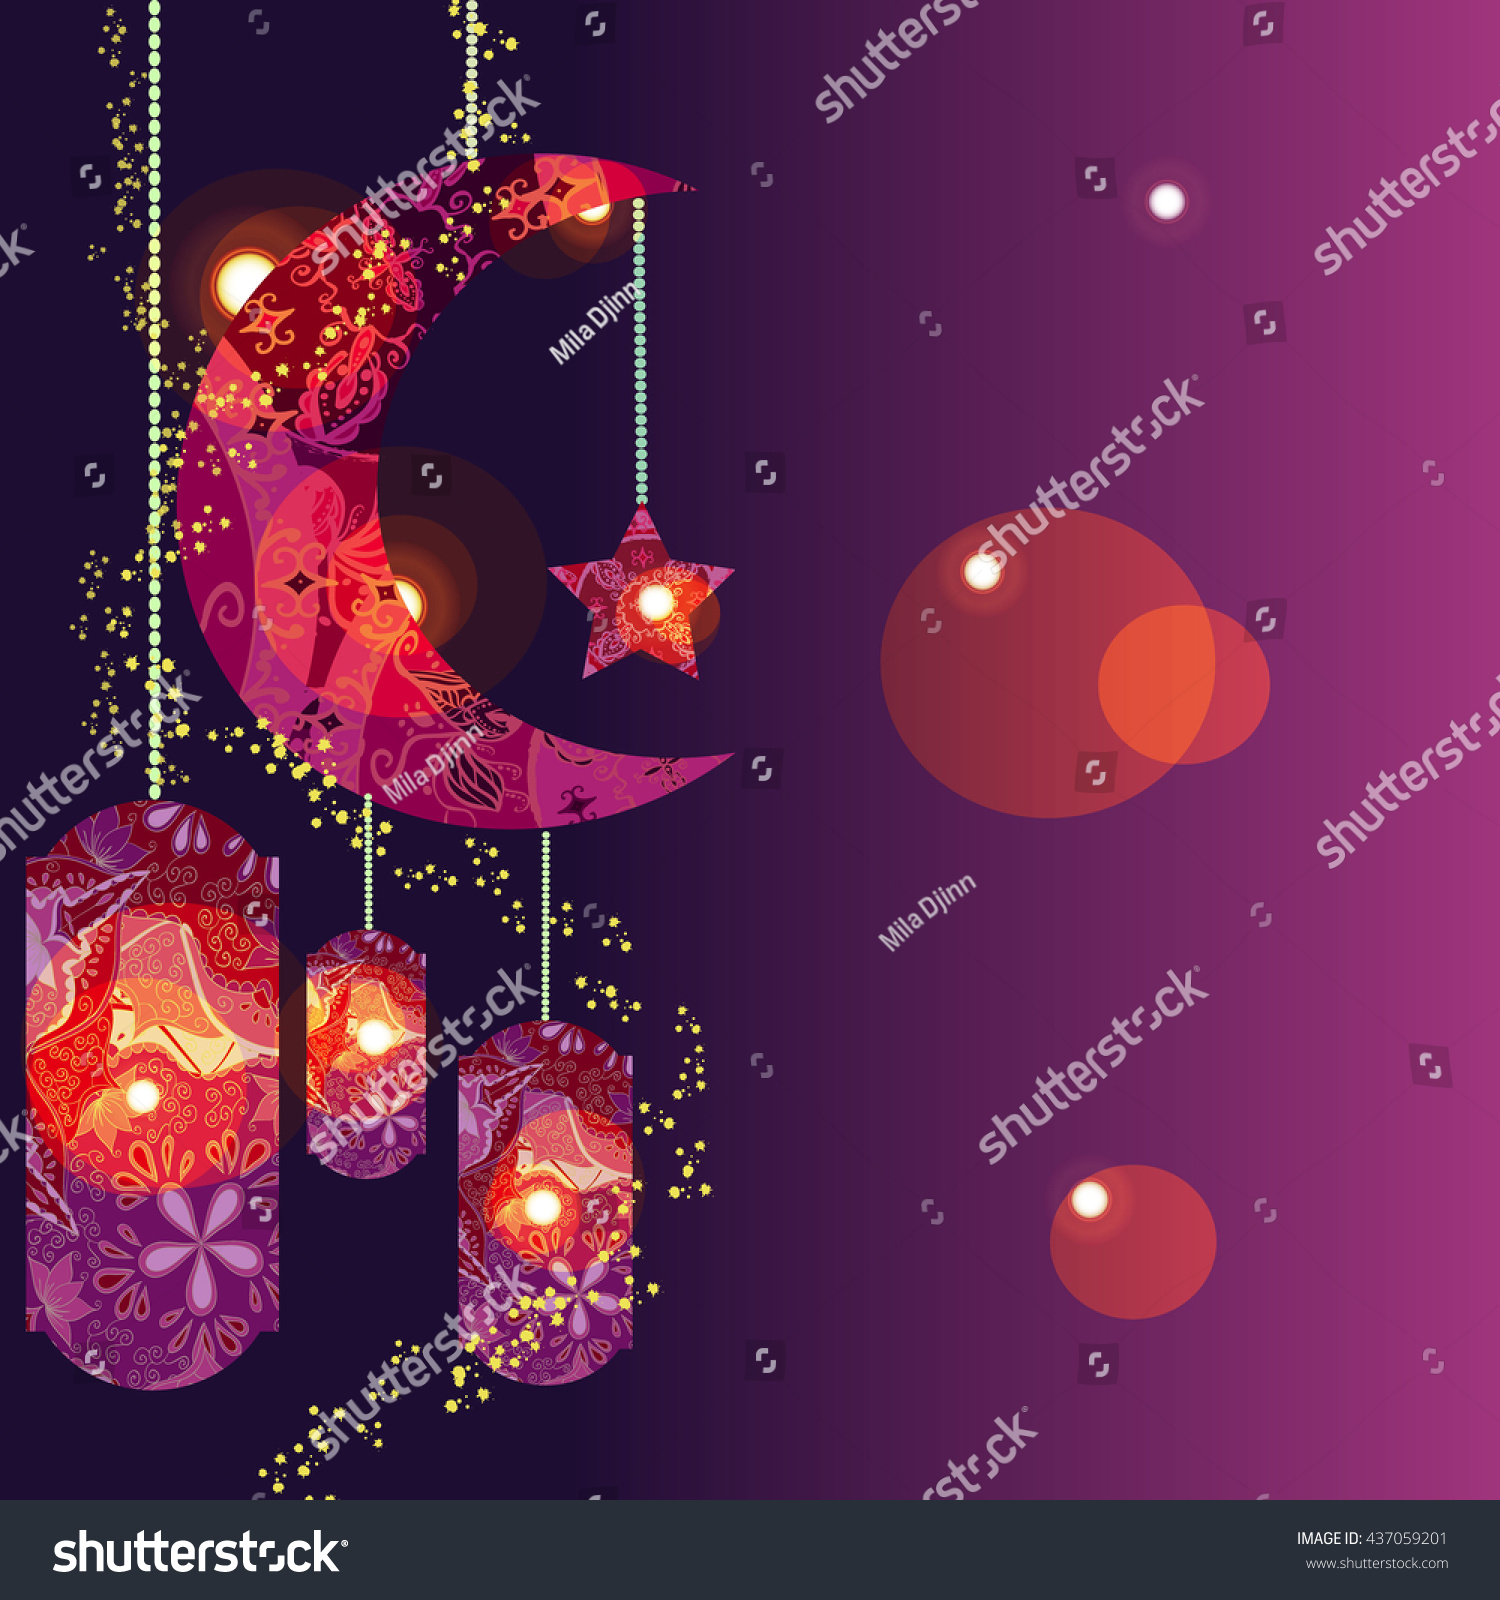 Download Modern Eid Al-Fitr Decorations - stock-vector-muslim-festival-eid-al-fitr-eid-mubarak-and-ramadan-concept-with-decorated-moon-and-star-vector-437059201  Photograph_481381 .jpg